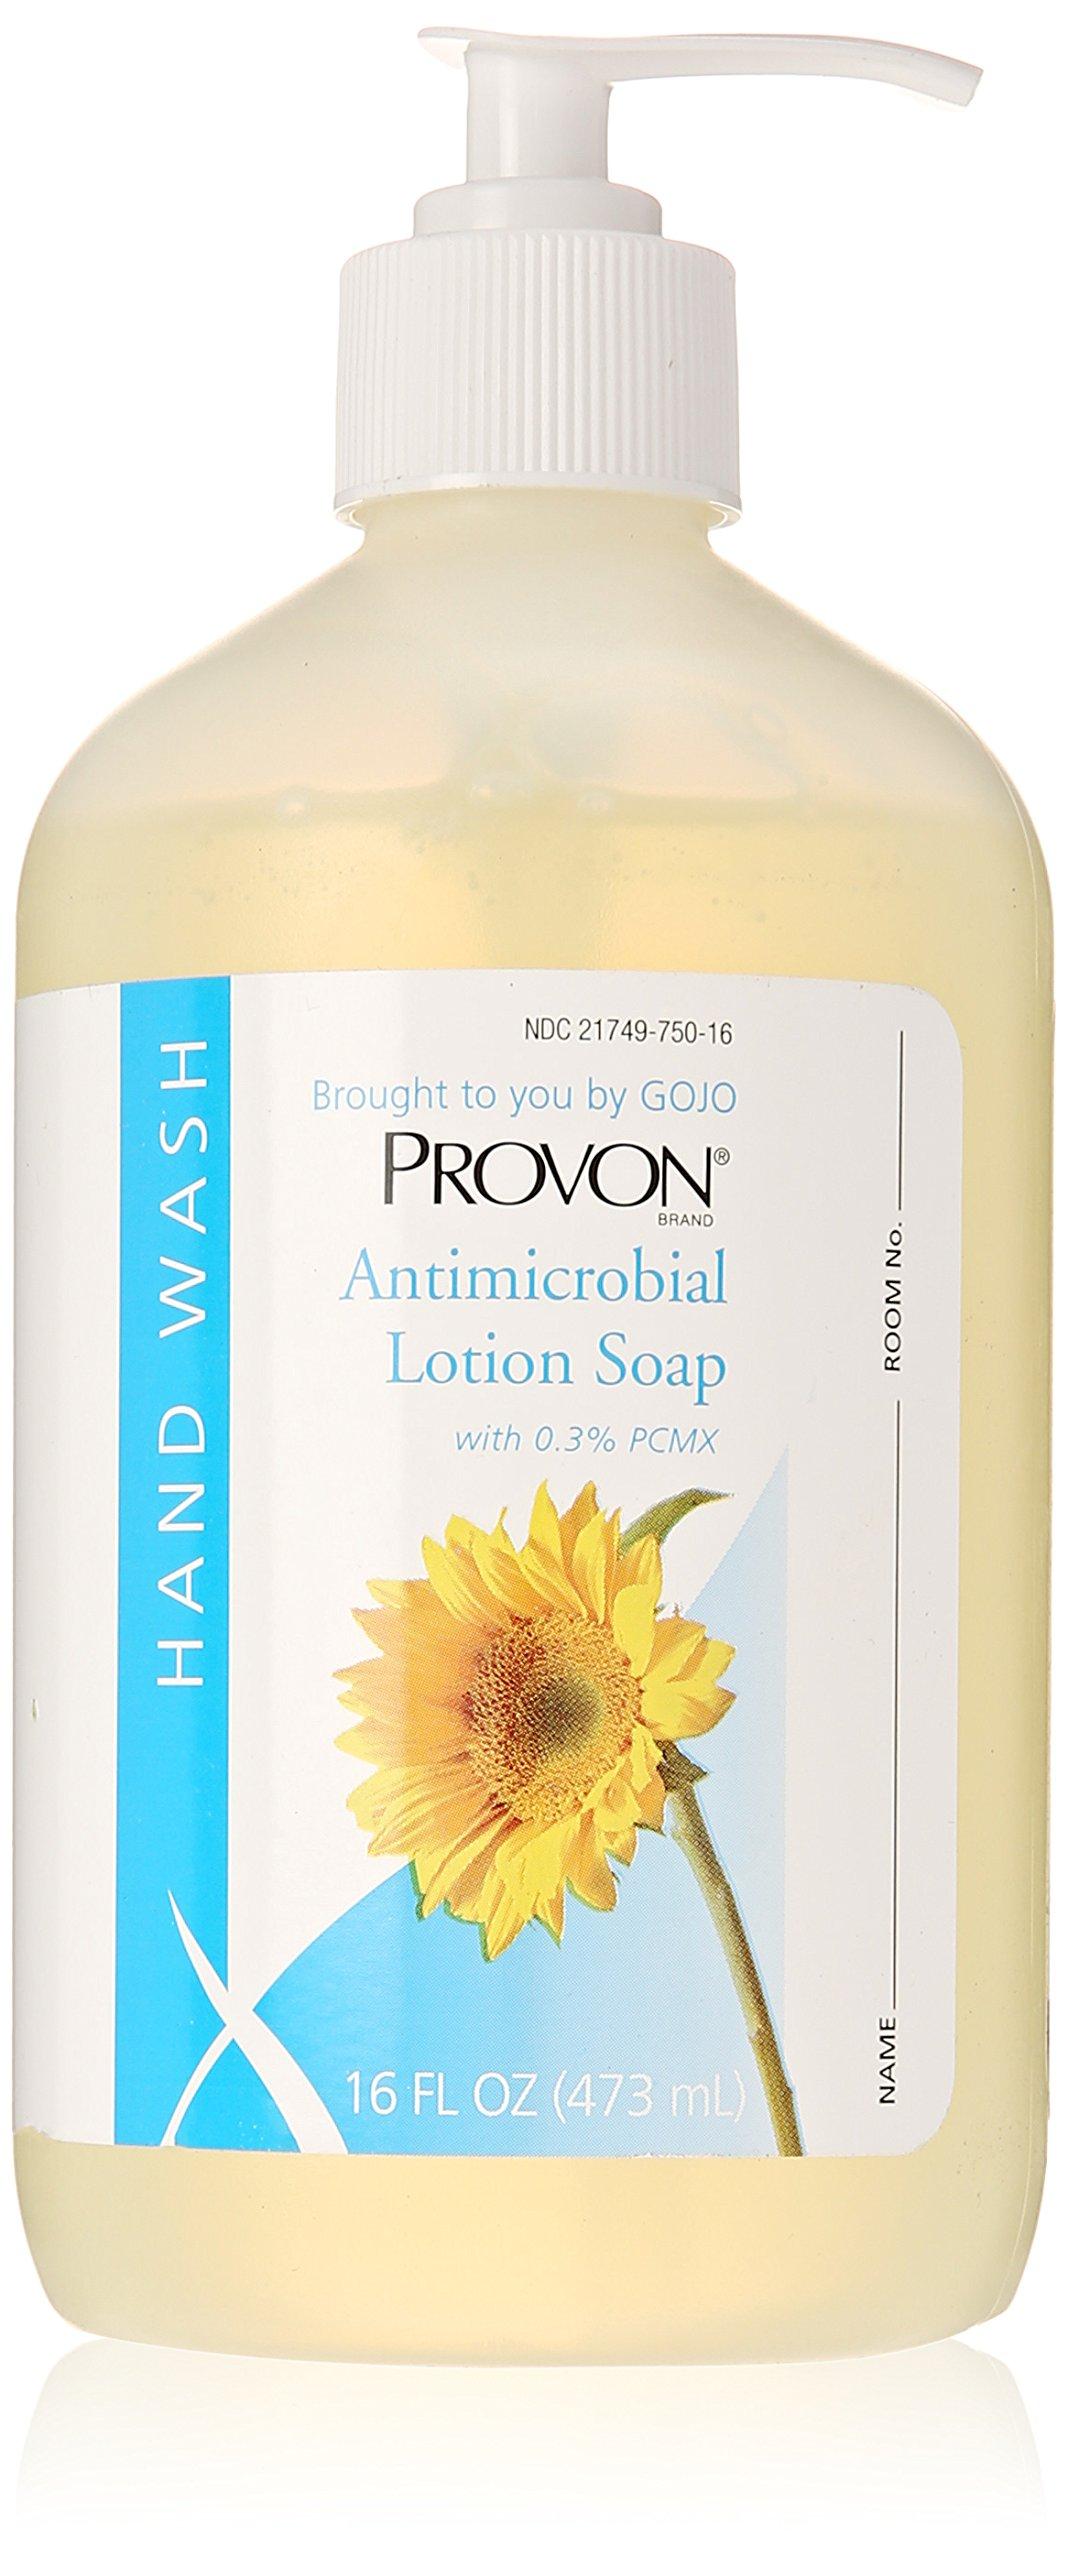 Provon Antimicrobial Lotion Soap - 16 oz Pump